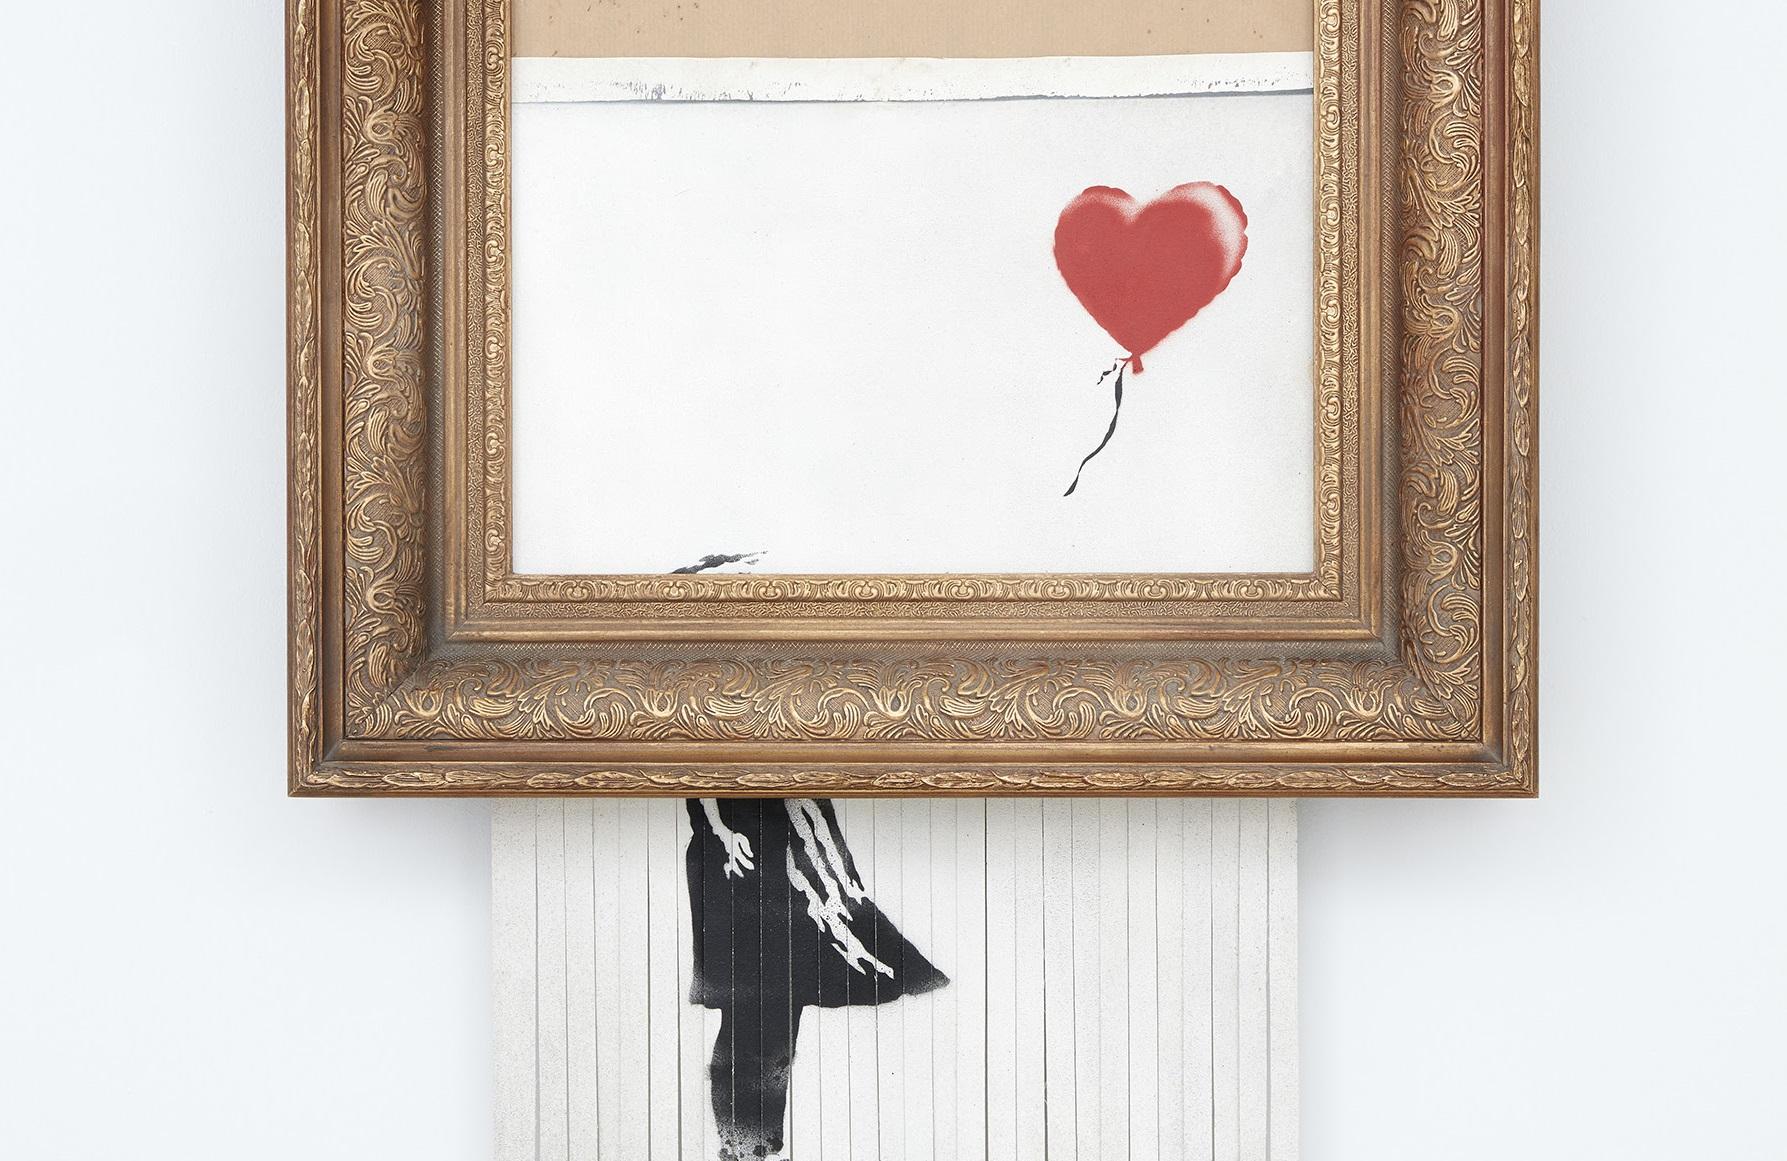 Il Banksy tritato torna all'asta. Sotheby's presenta Love is in the Bin